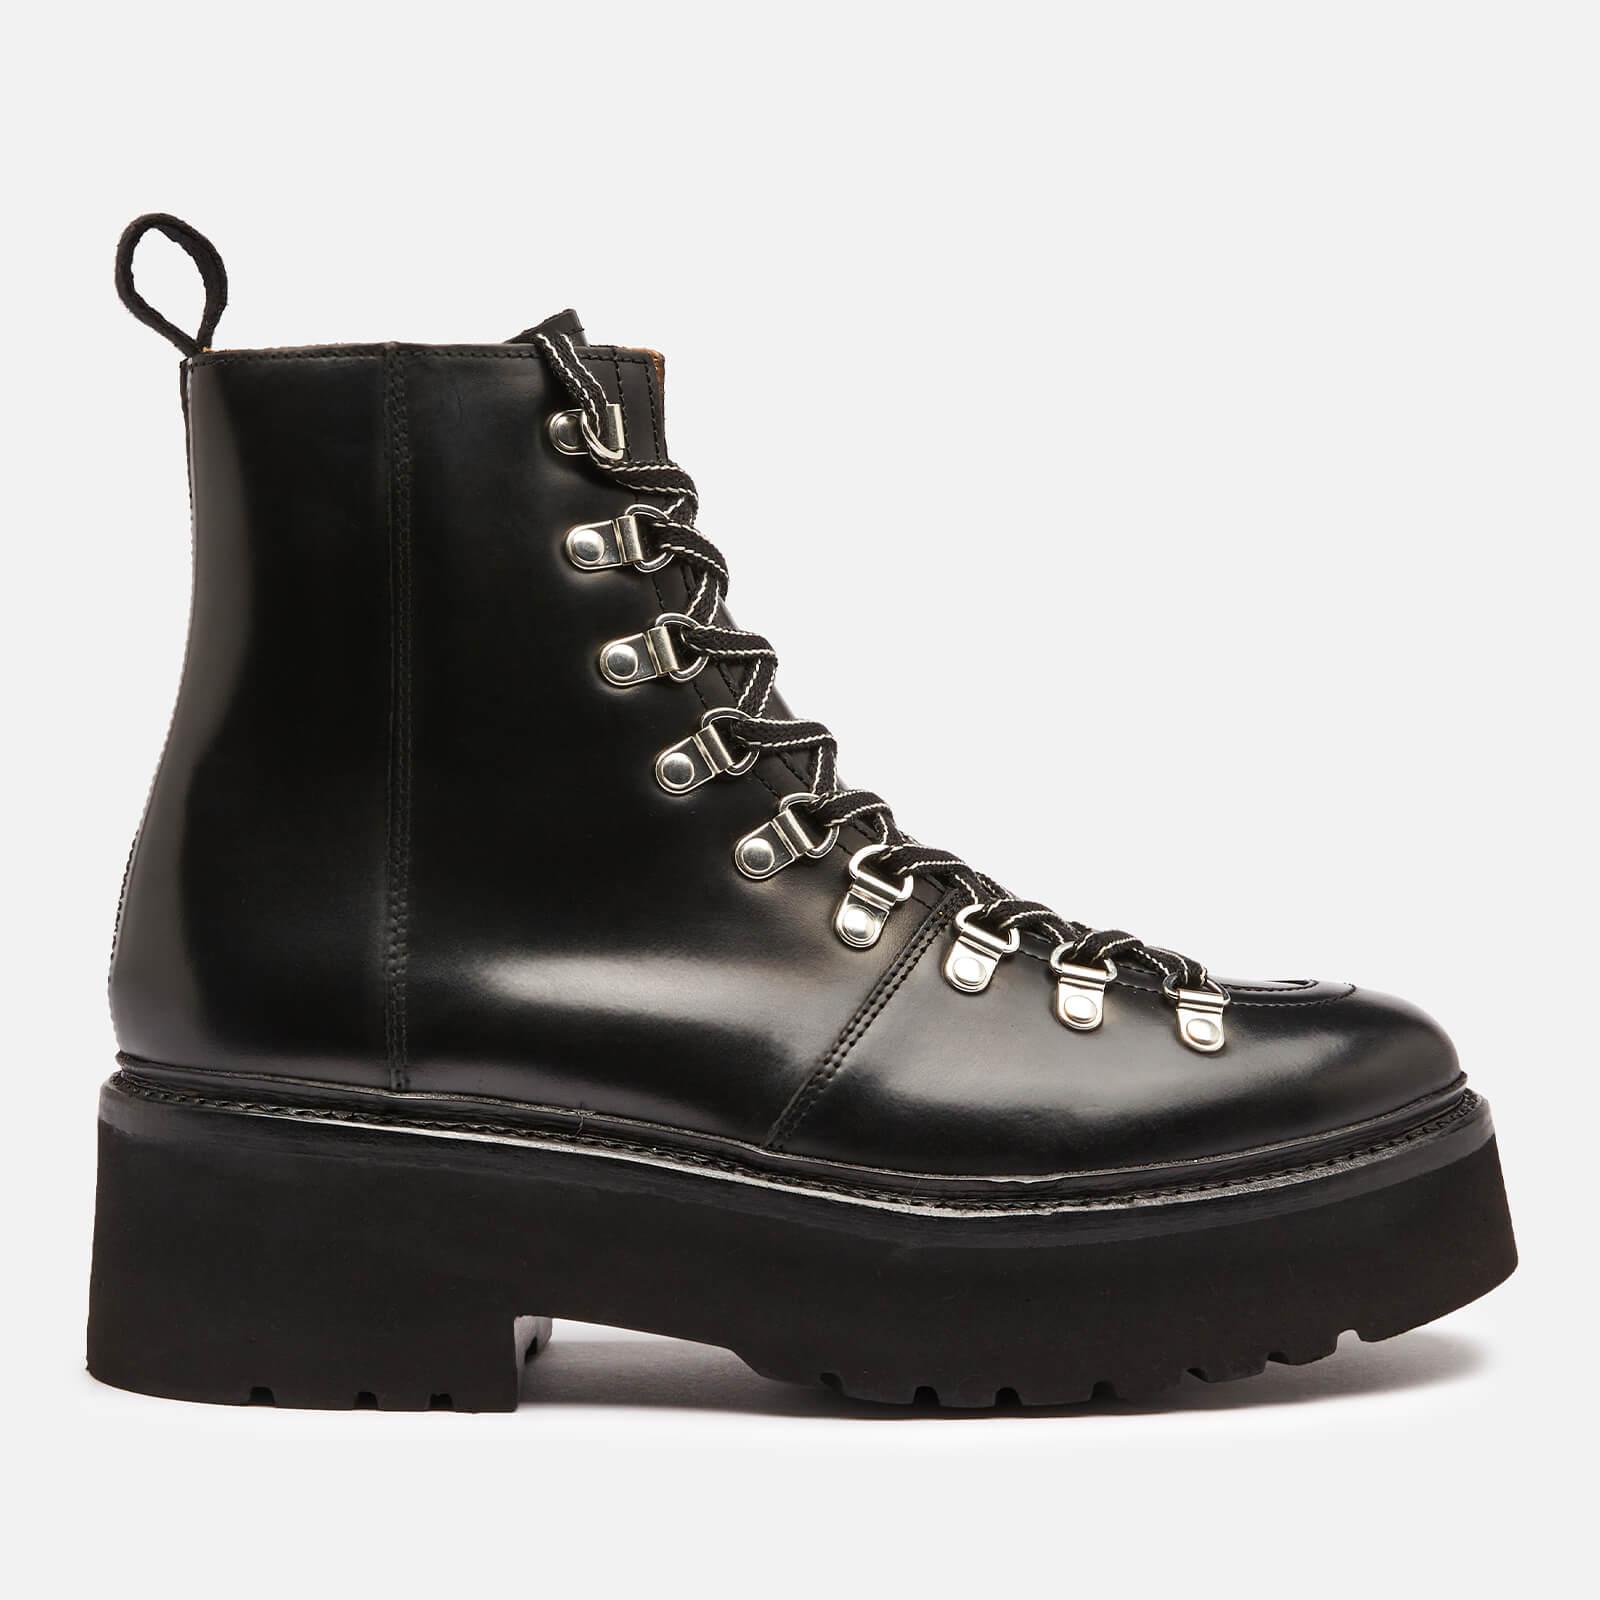 Grenson Women's Nanette Chunky Leather Hiking Style Boots - Black - Uk 3